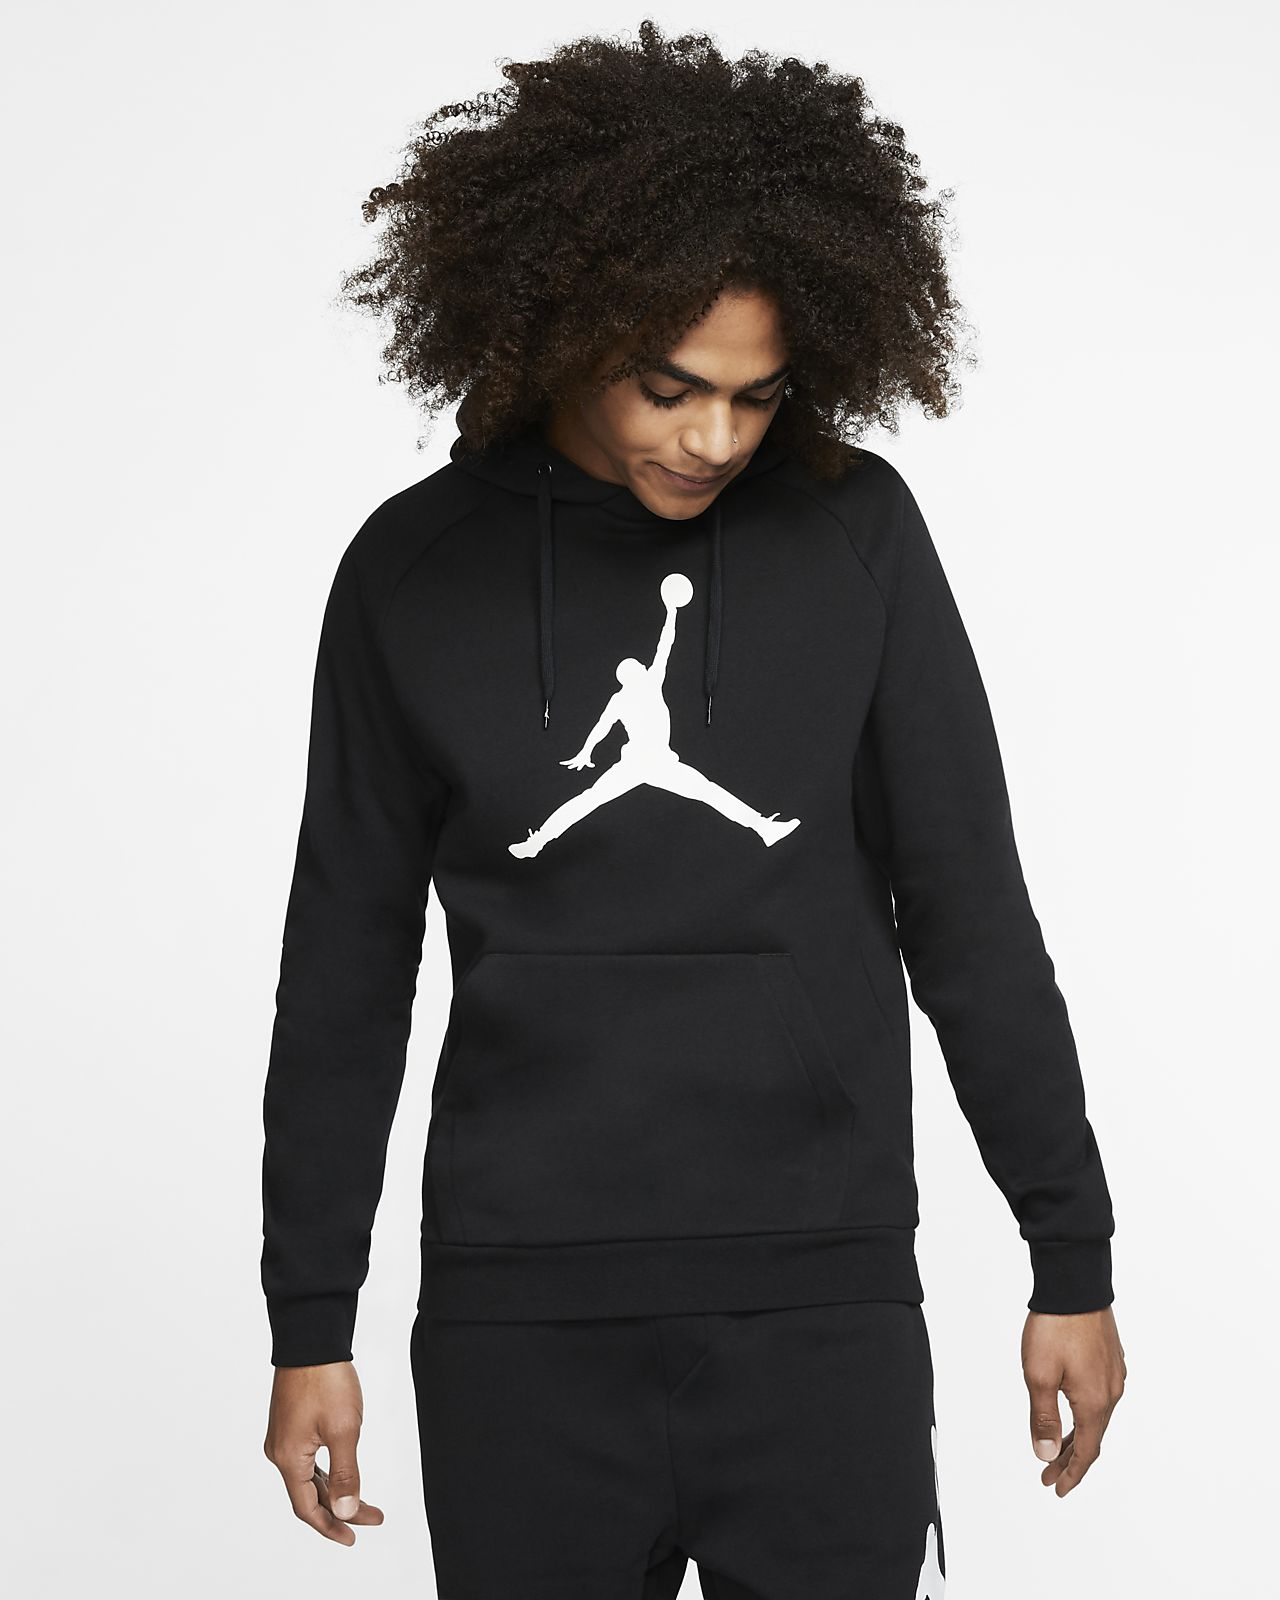 miglior servizio 95f71 a96f8 Felpa pullover in fleece con cappuccio Jordan Jumpman Logo - Uomo